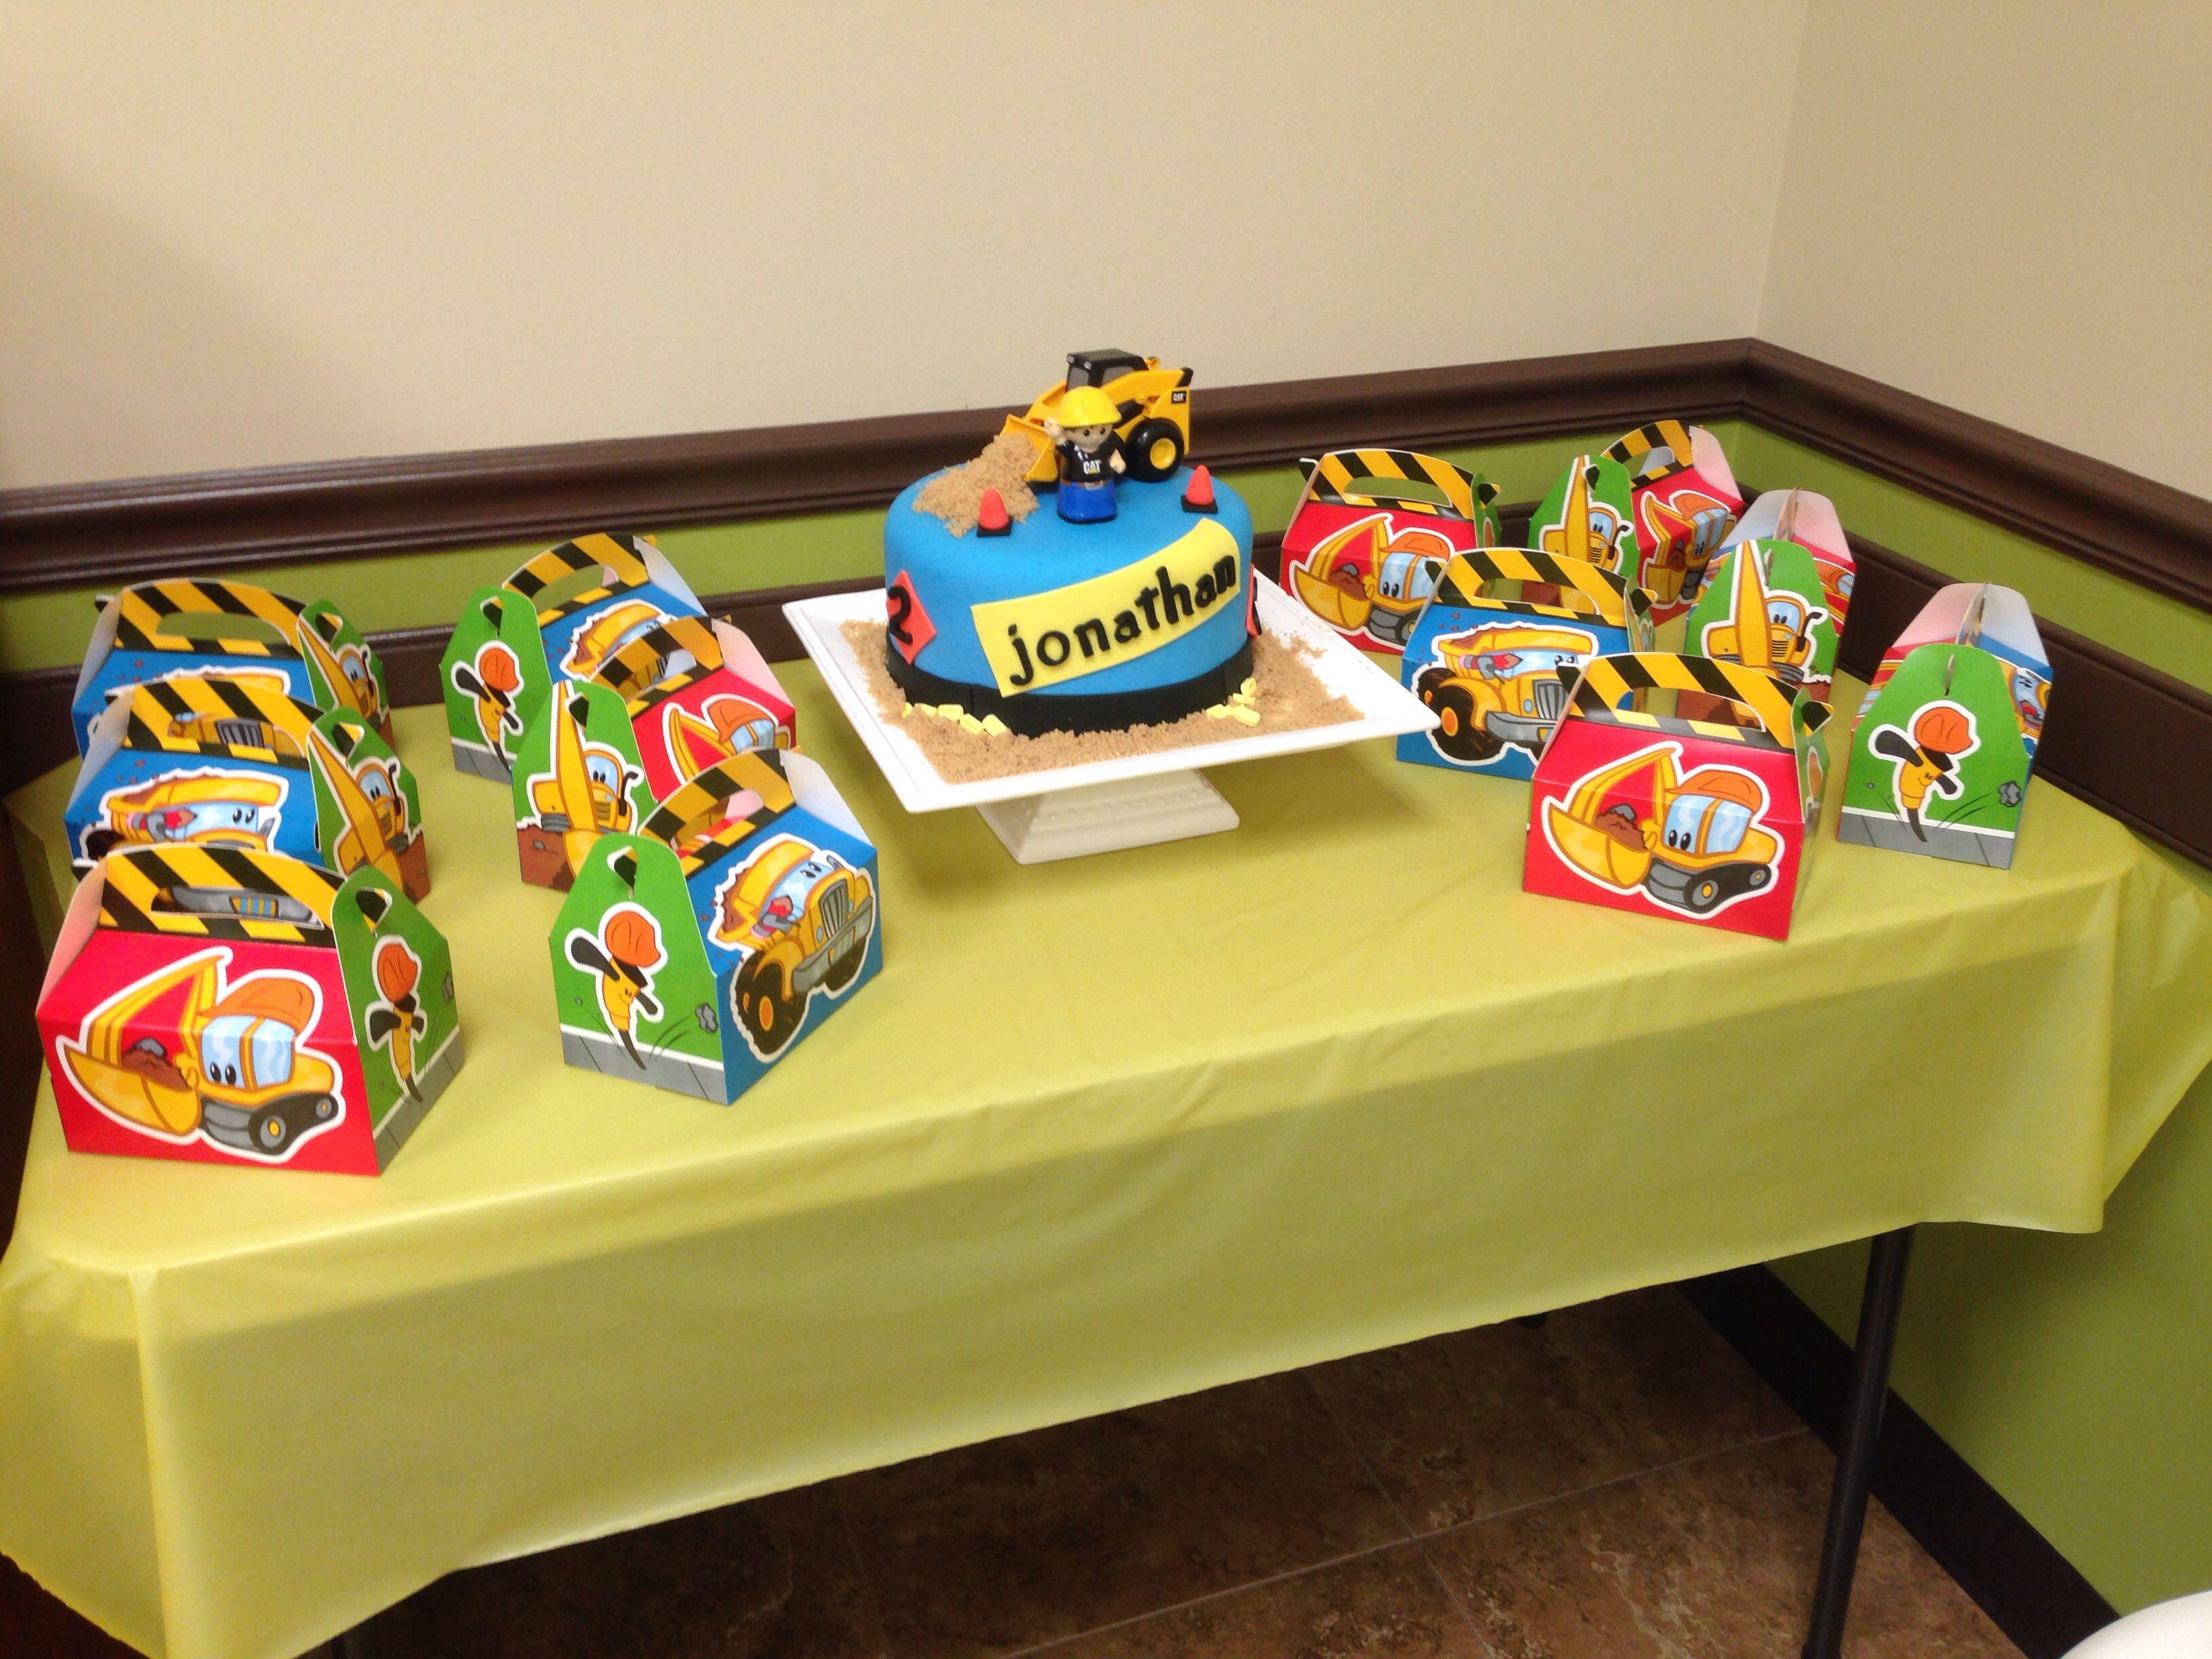 Tonka truck cake Boy birthday party ideas Pinterest Tonka